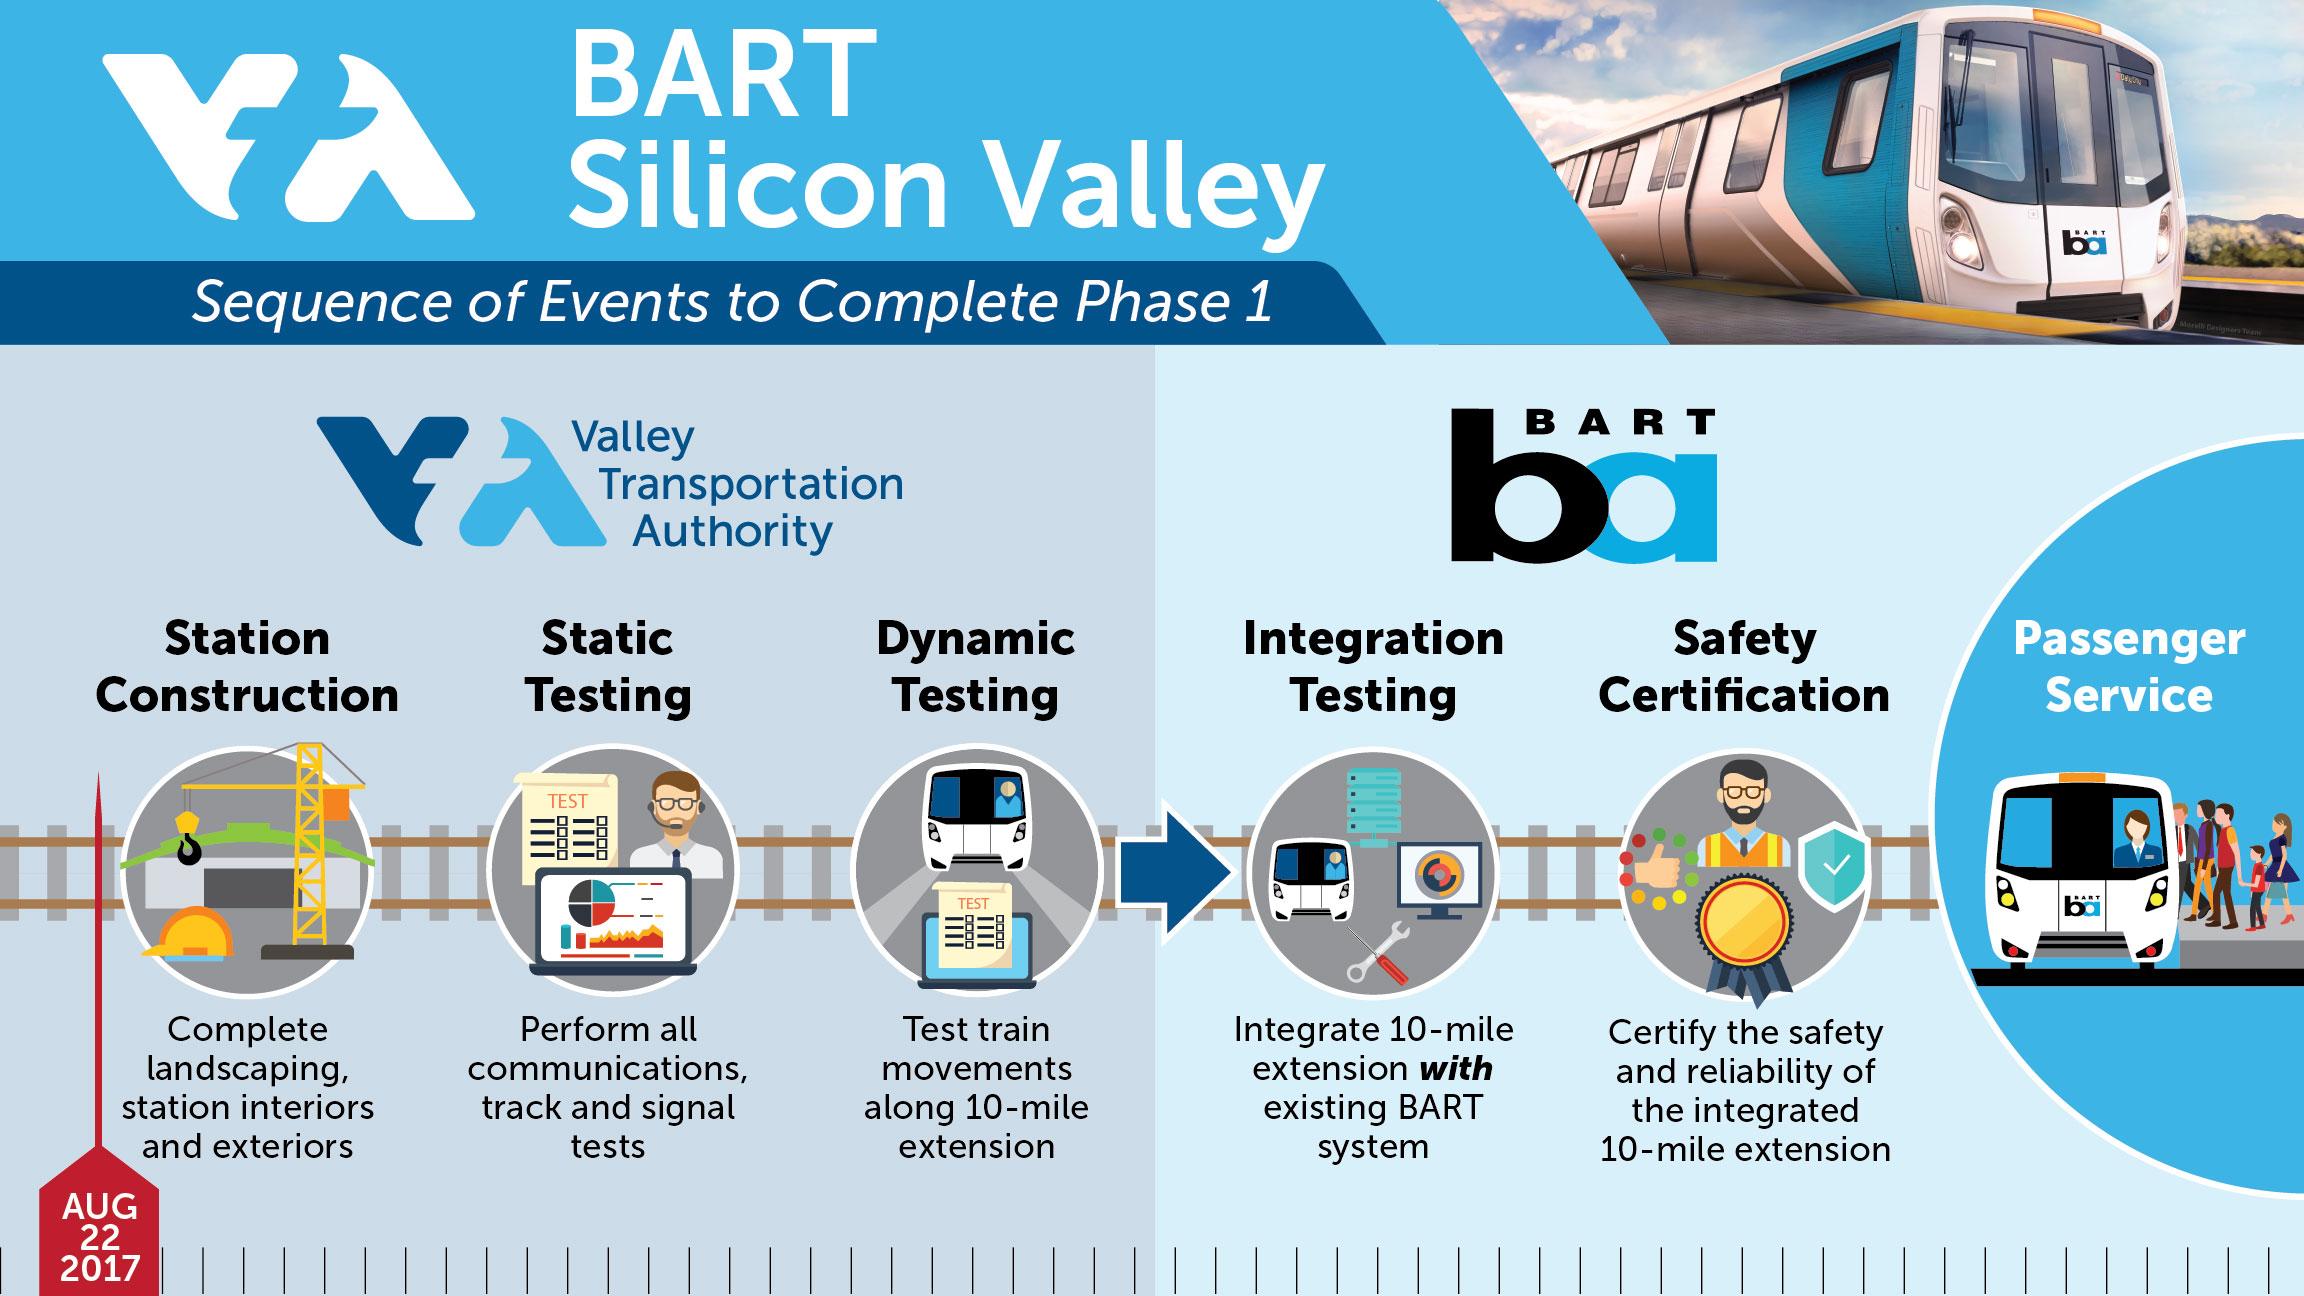 BART Phase I timeline to passenger service